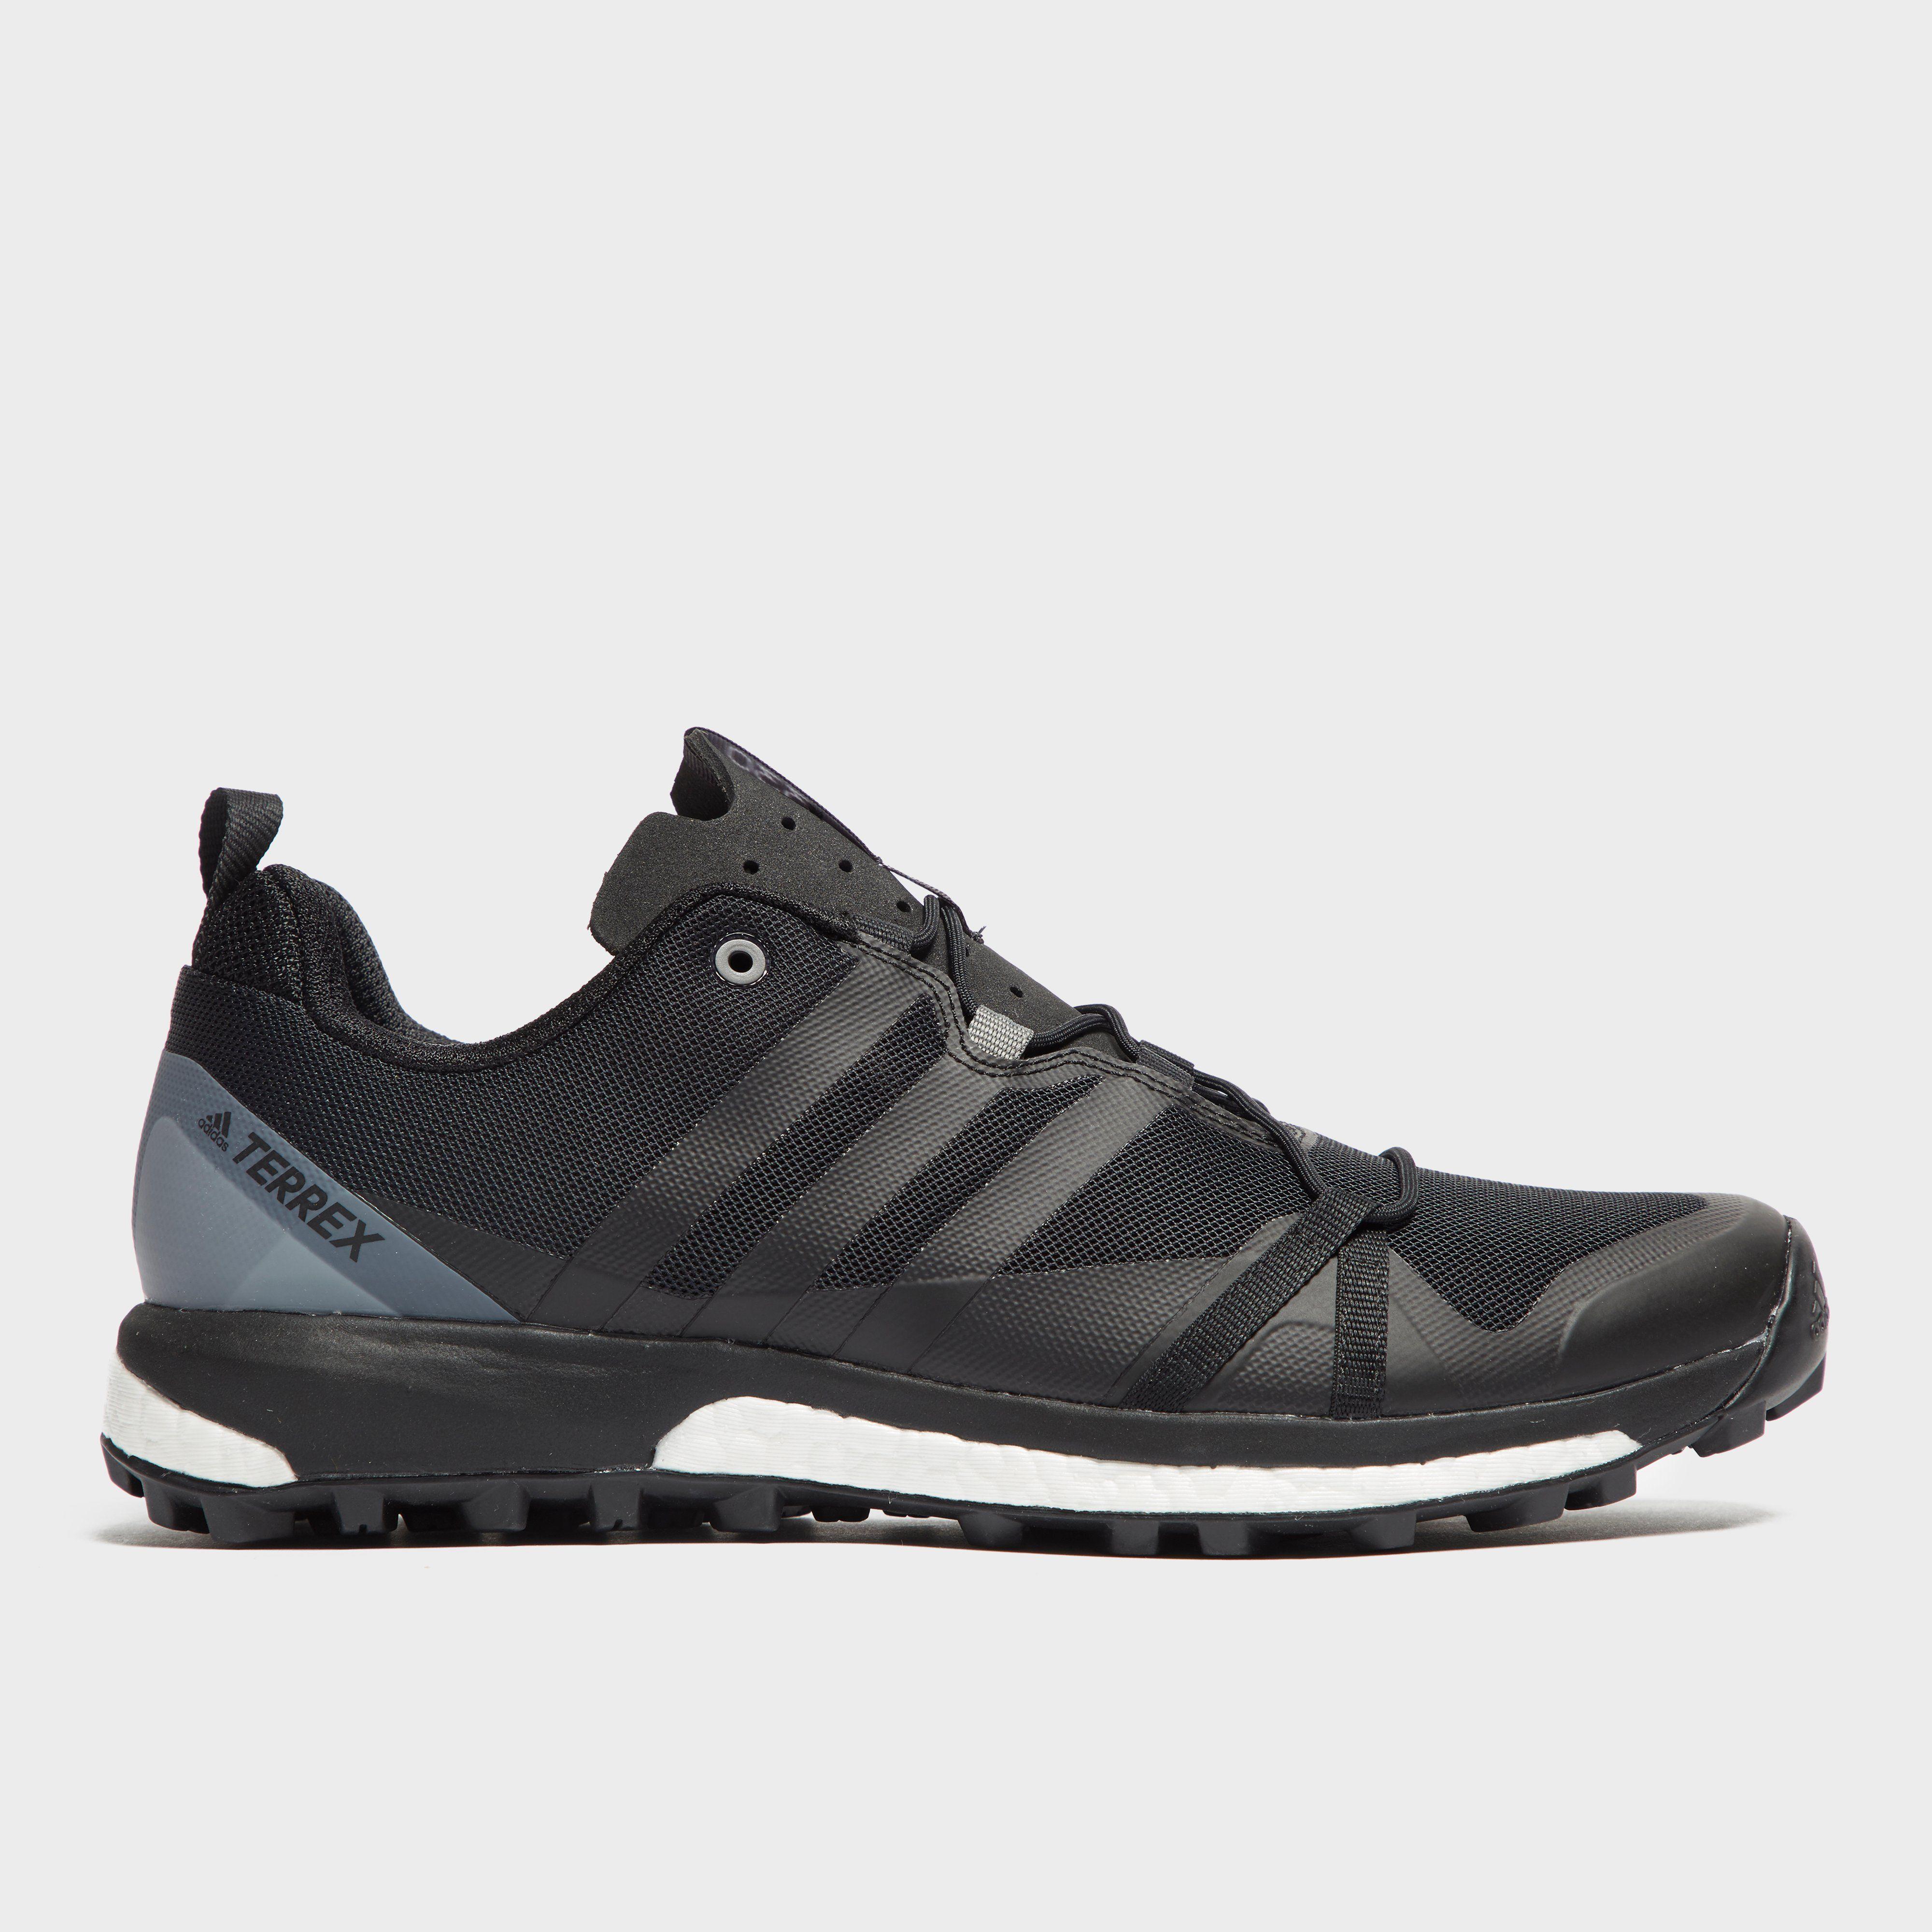 ADIDAS Men's TERREX Agravic Trail Shoes